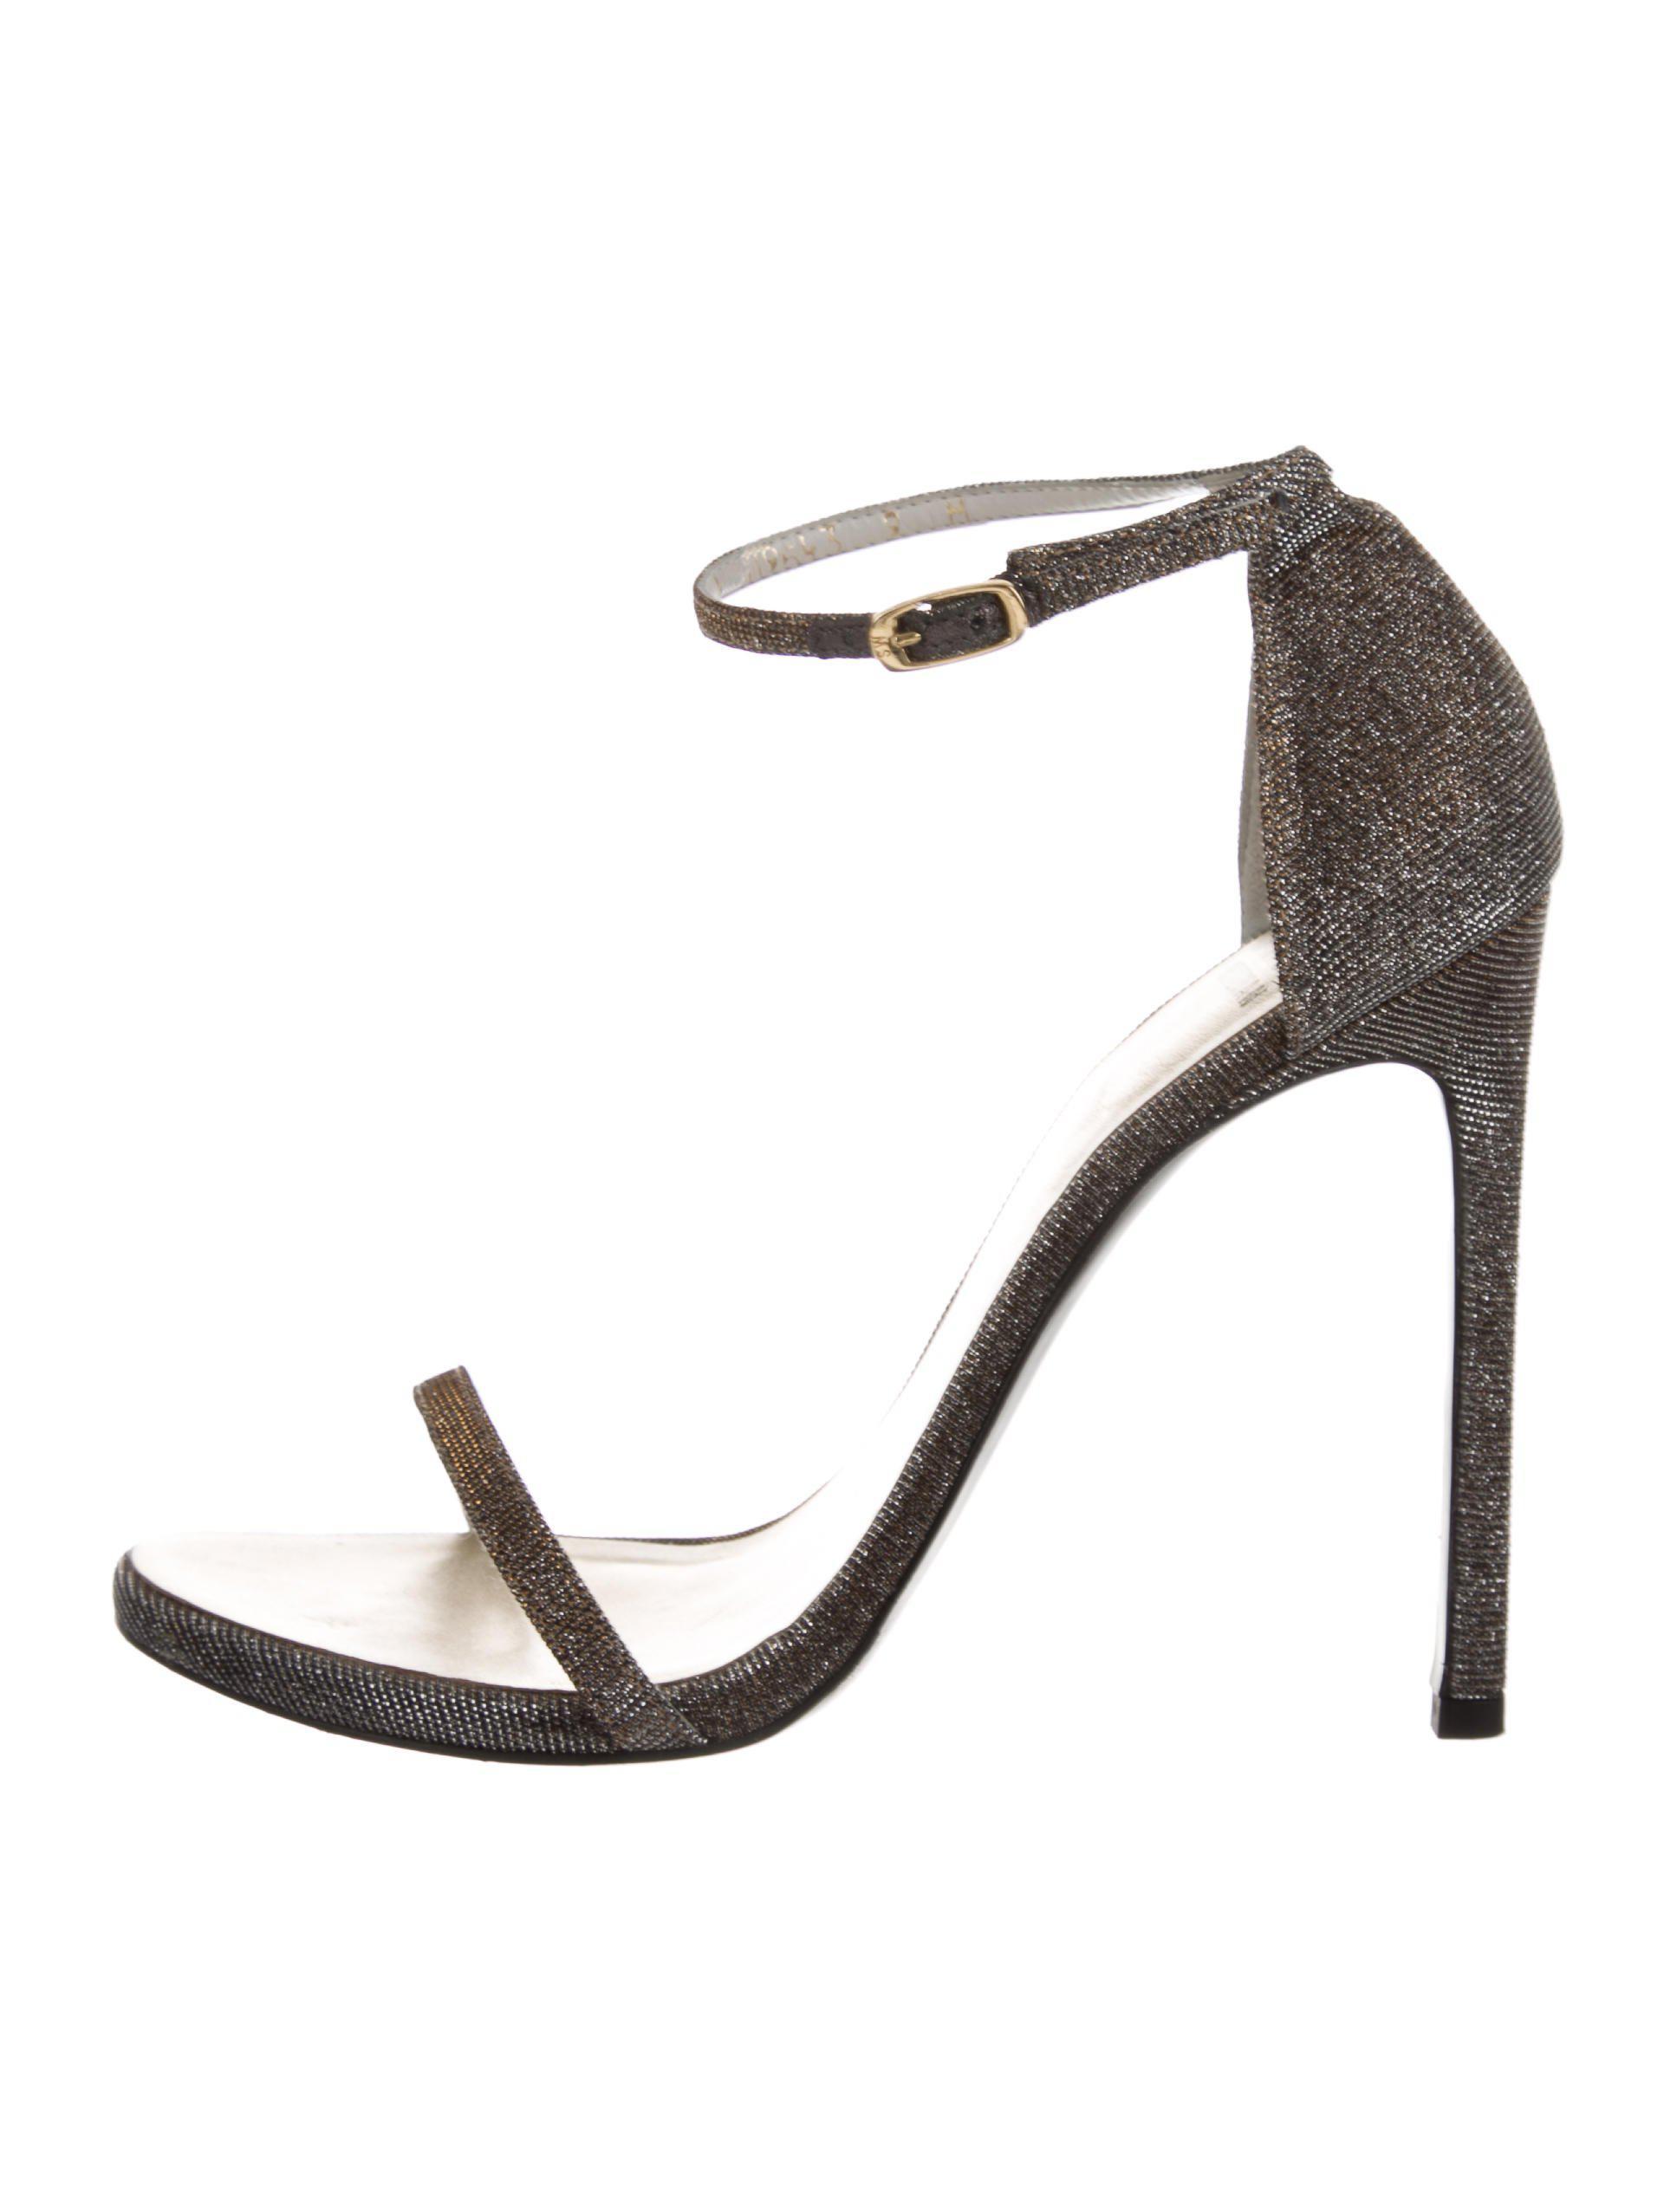 ad2c30ac23b Lyst - Stuart Weitzman Glitter Ankle Strap Sandals Gold in Metallic